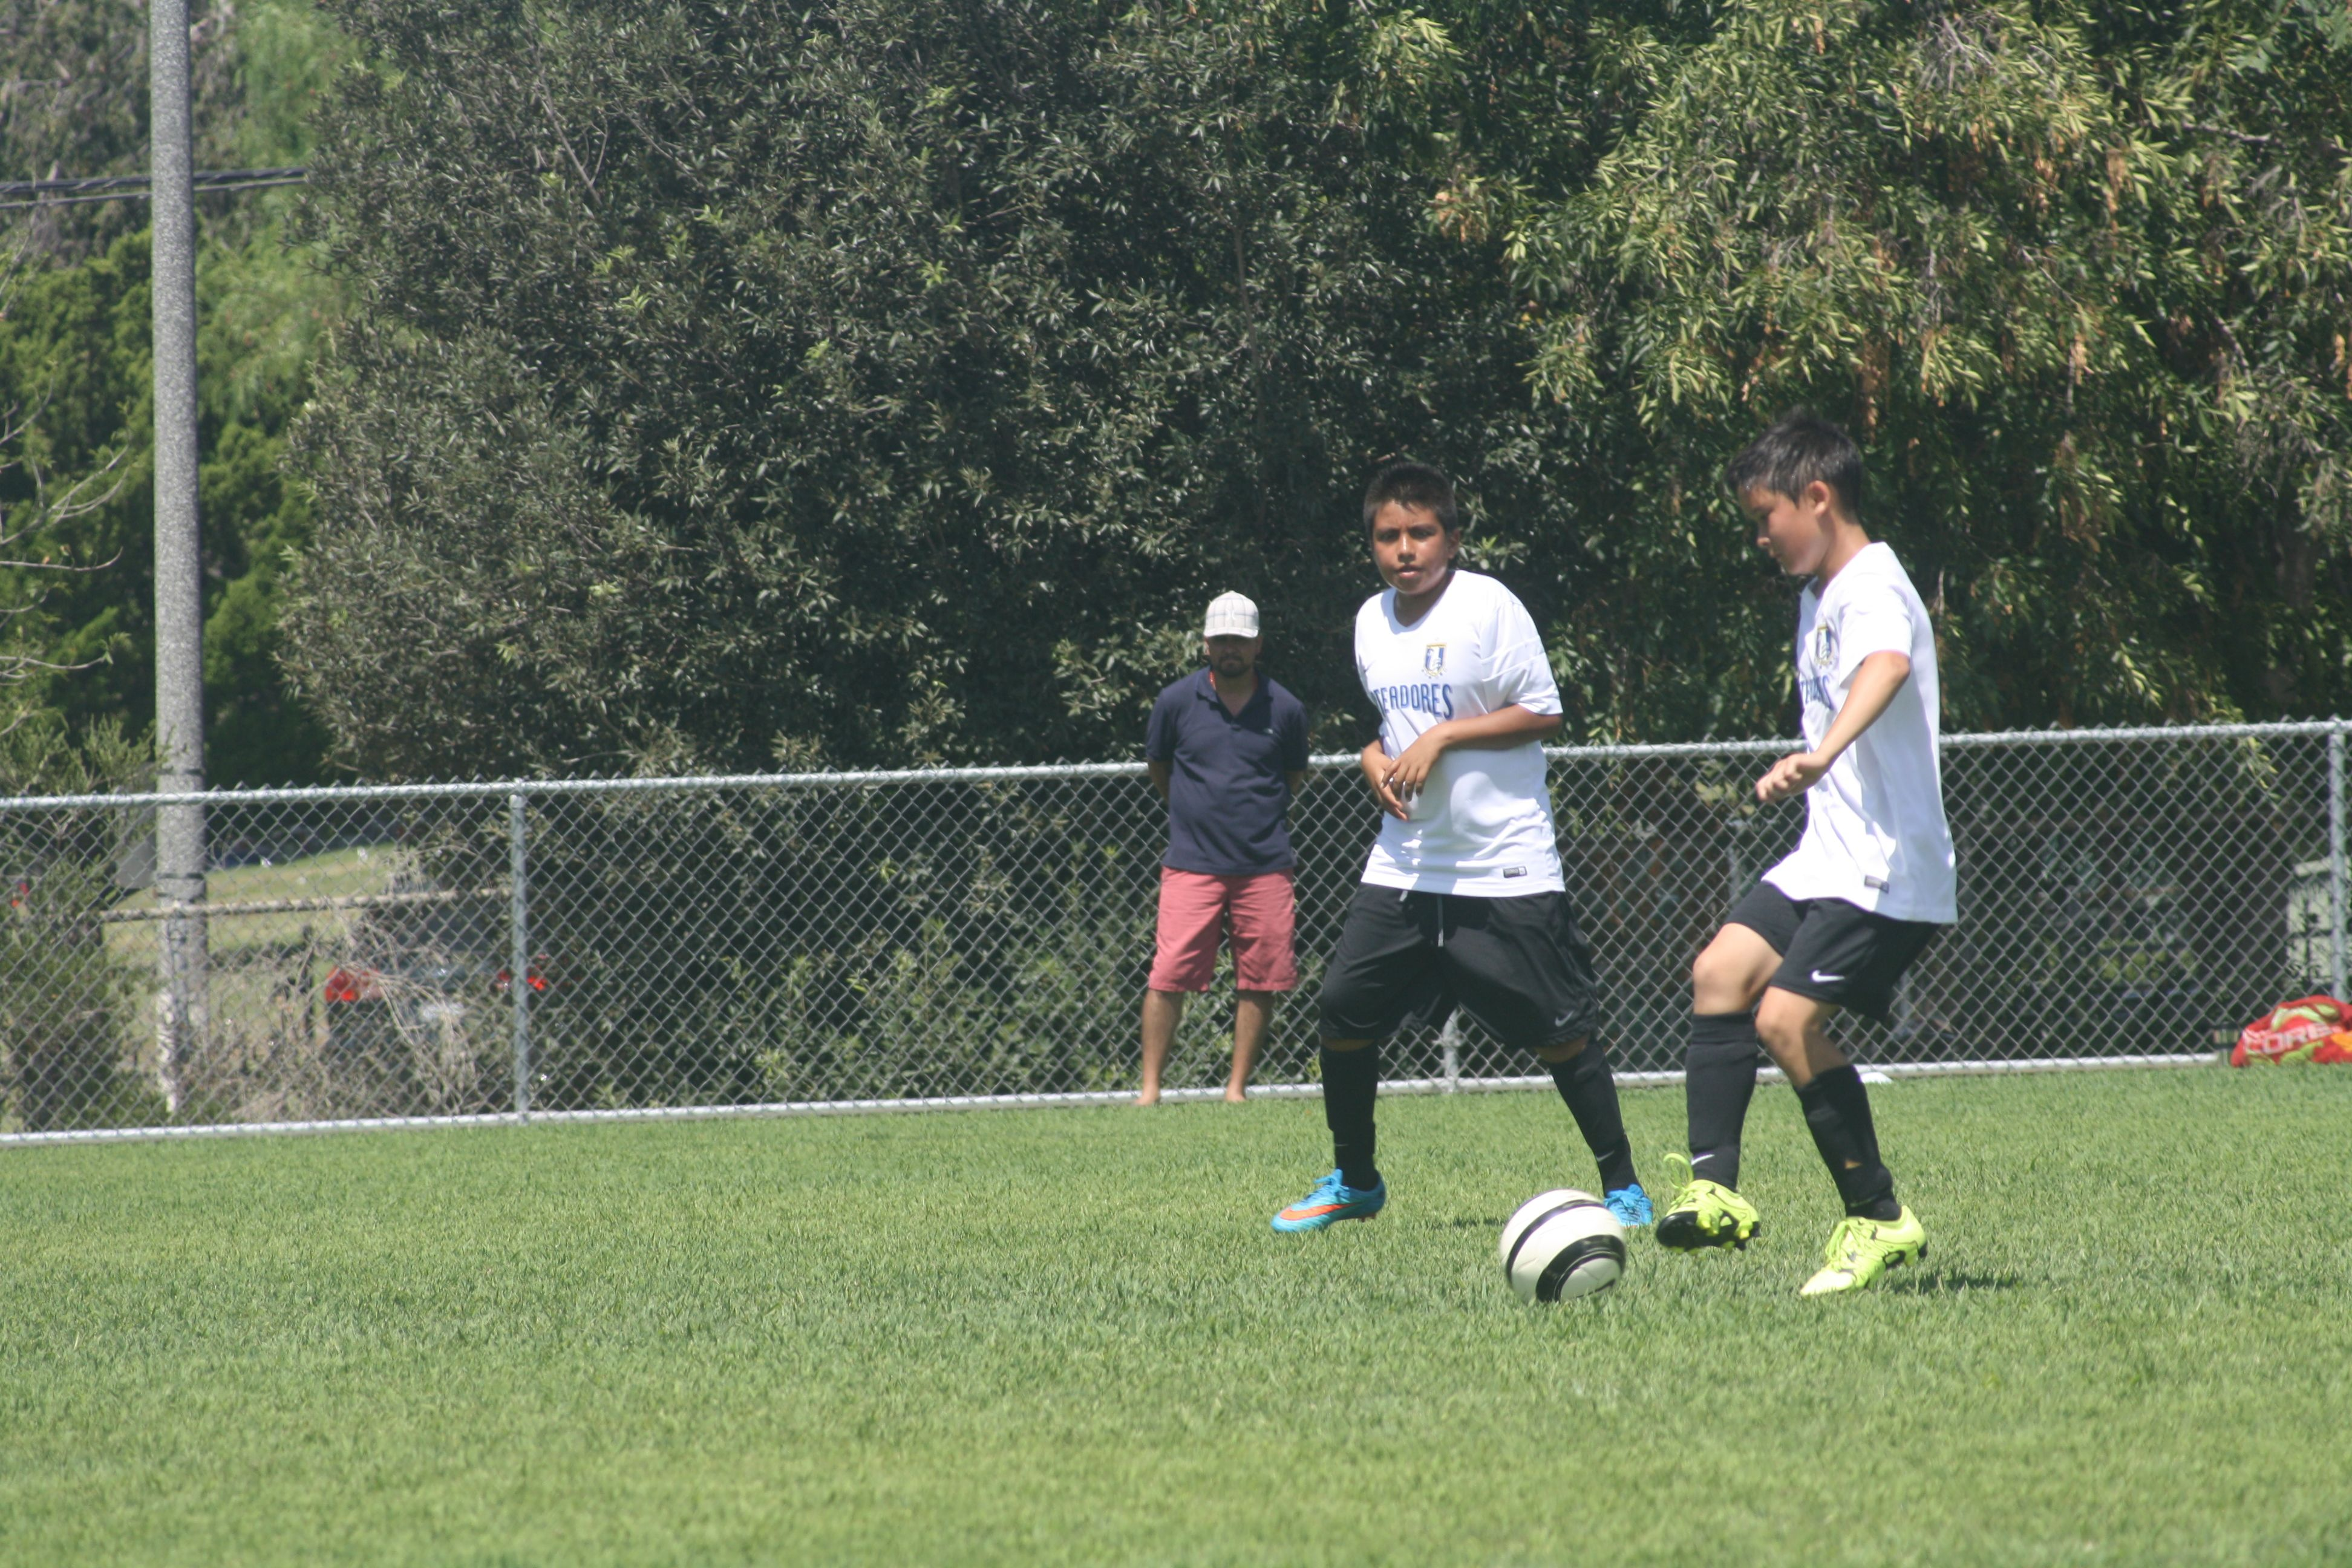 Pin By Kevin Tanaka On Pateadores La B03 Cruz Soccer Club Soccer League Youth Soccer